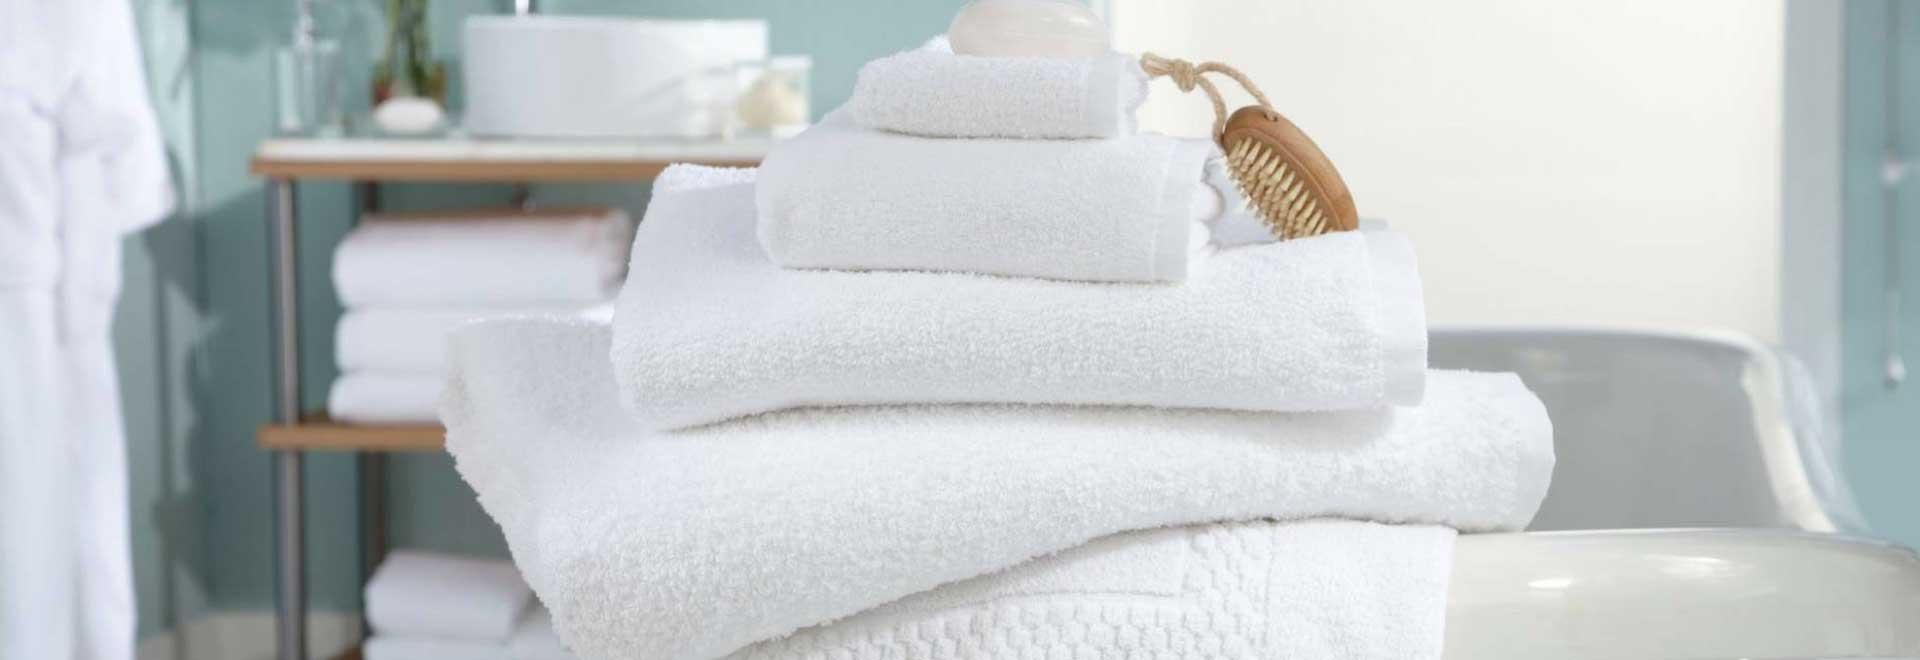 asciugamani spugna hotel martini e pari